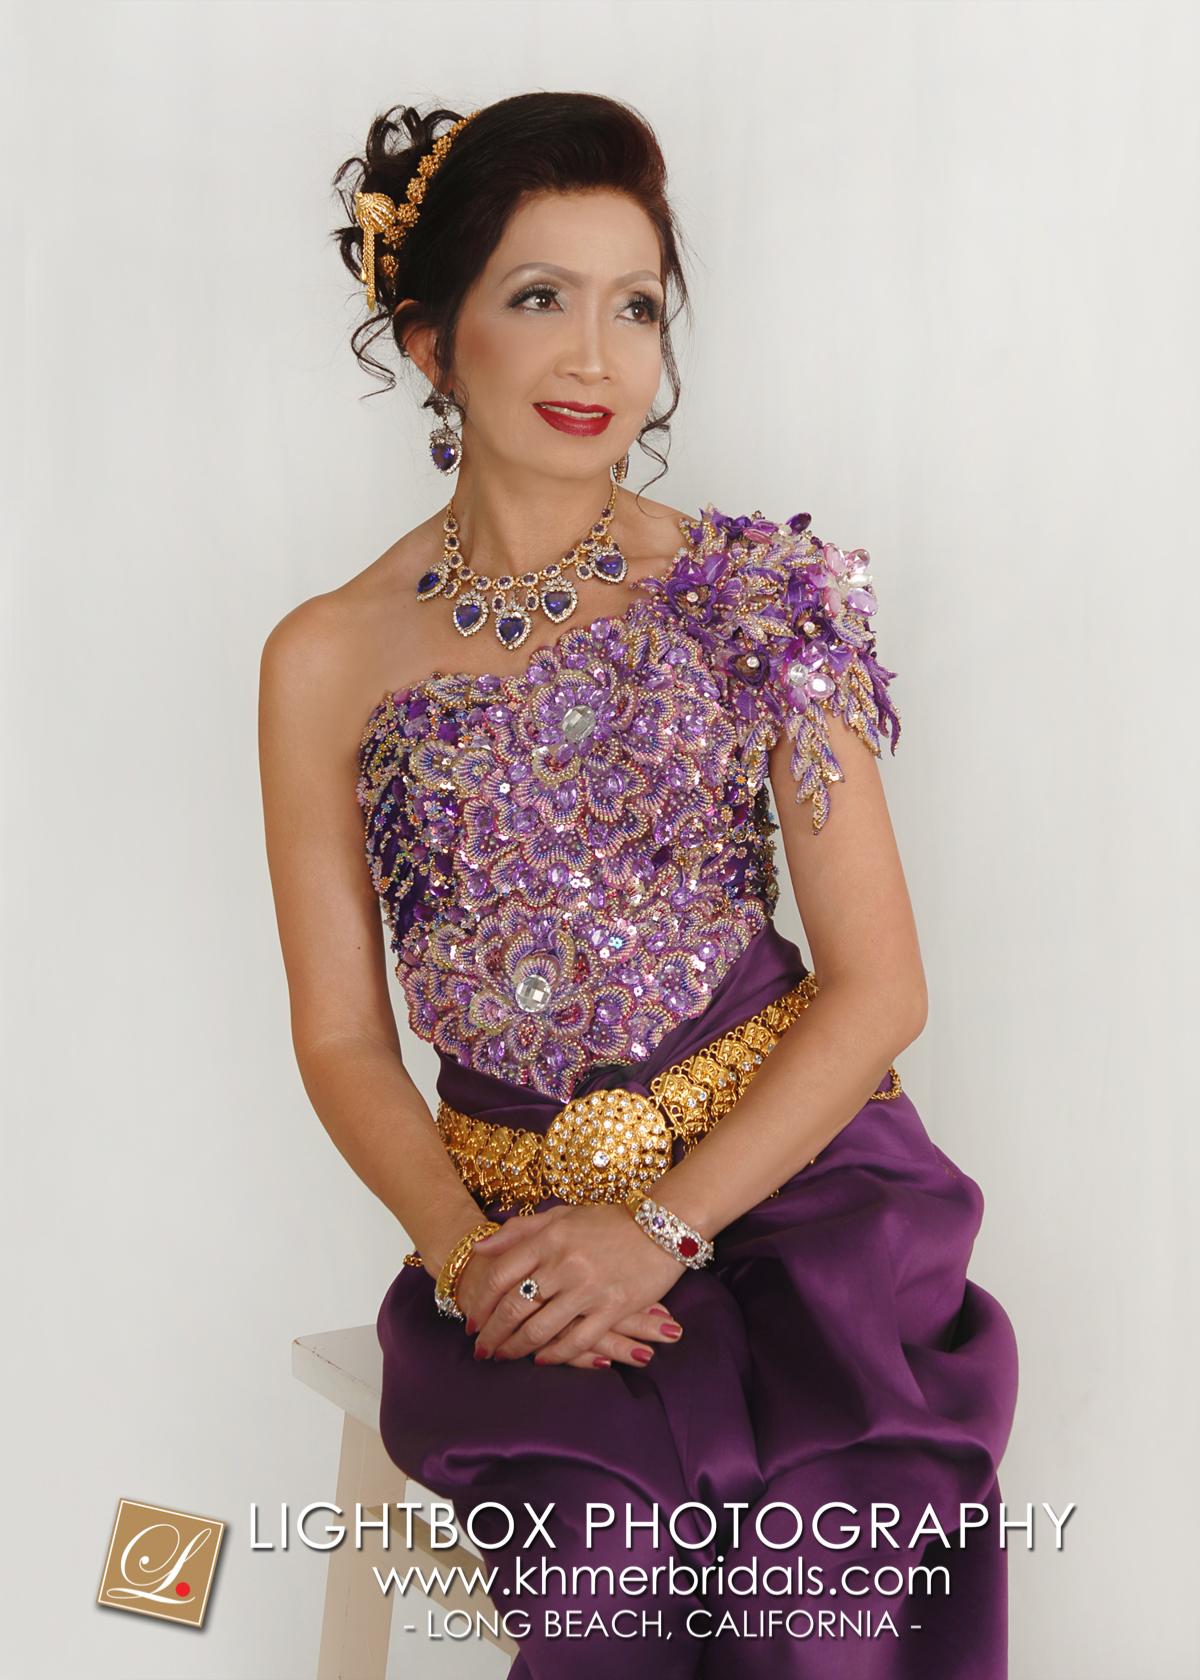 Apsara Khmer Bridal Wedding Photography and video-204.jpg